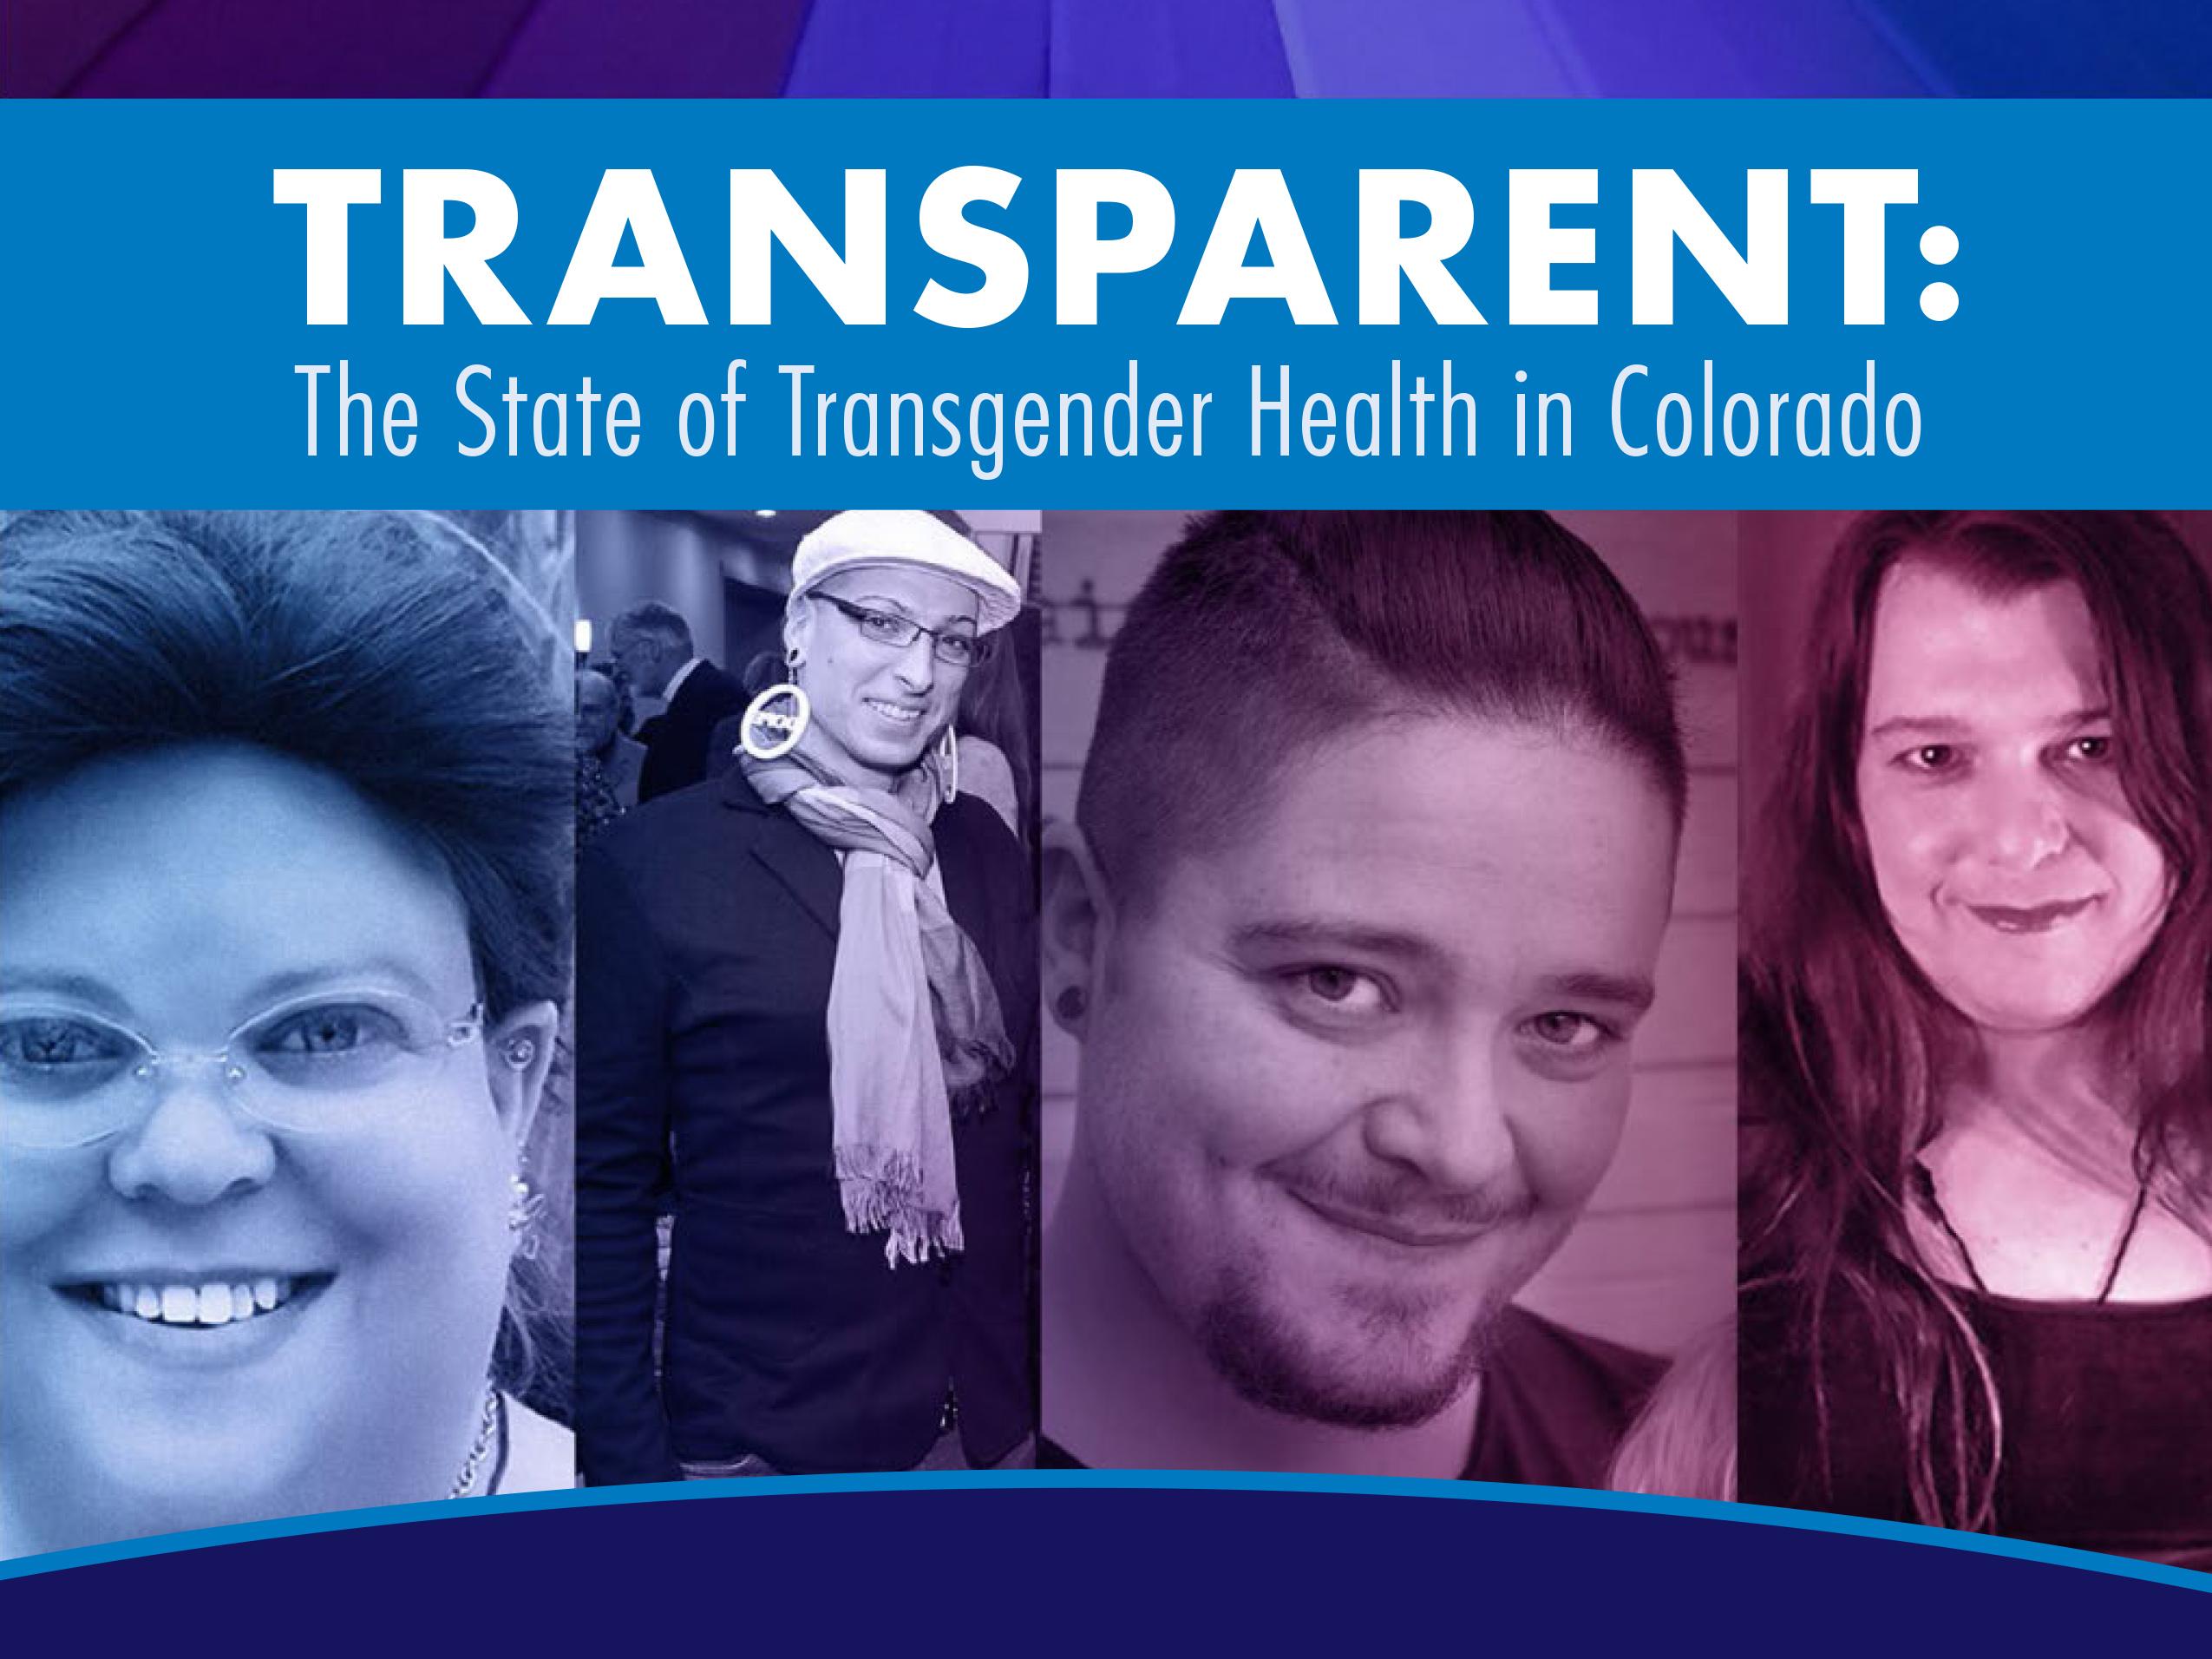 Photo: Transgender report